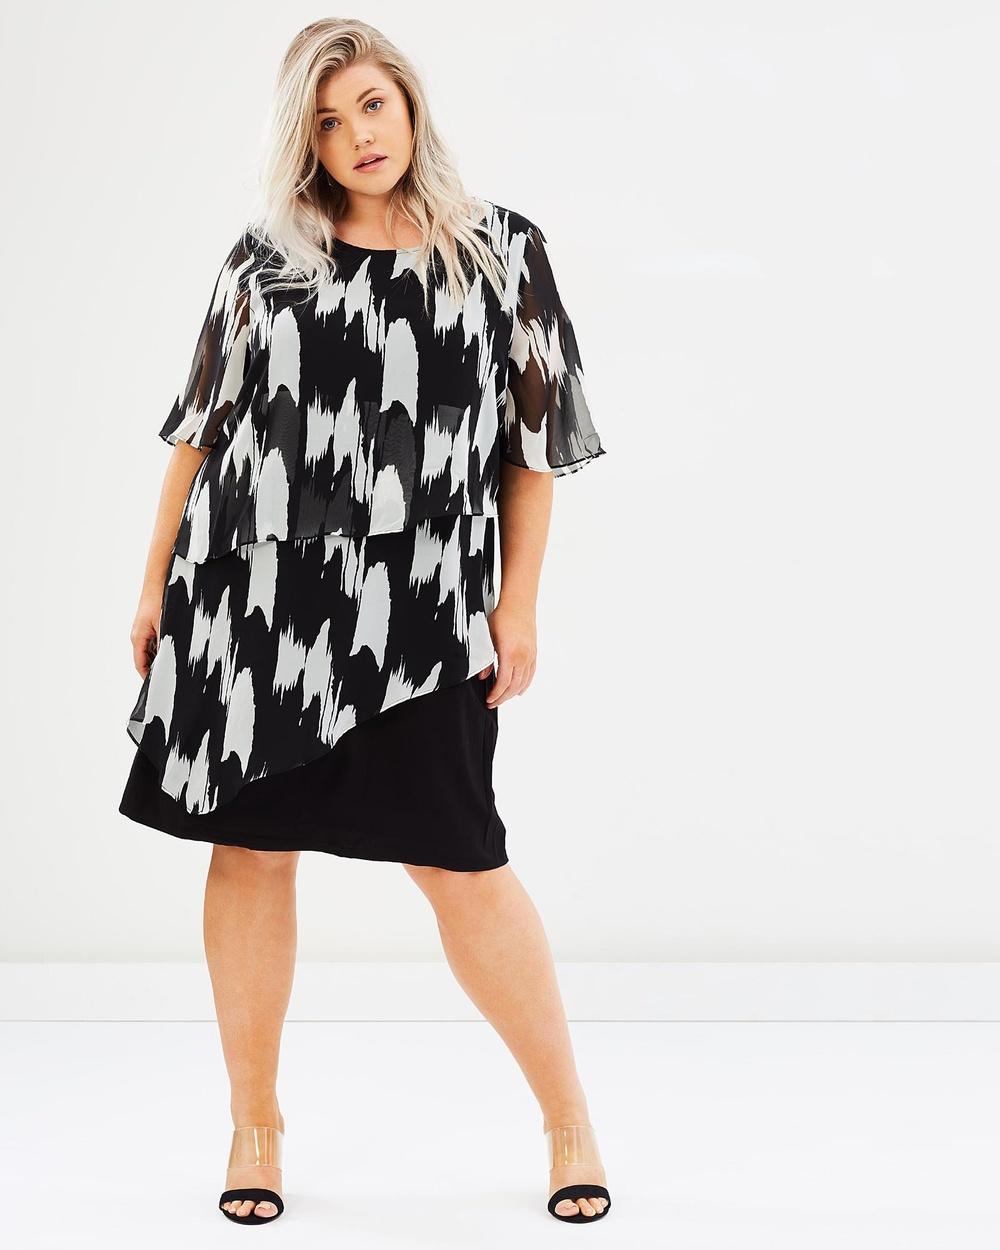 Advocado Plus Midnight Song Layered Dress Dresses Brushstroke Print Midnight Song Layered Dress